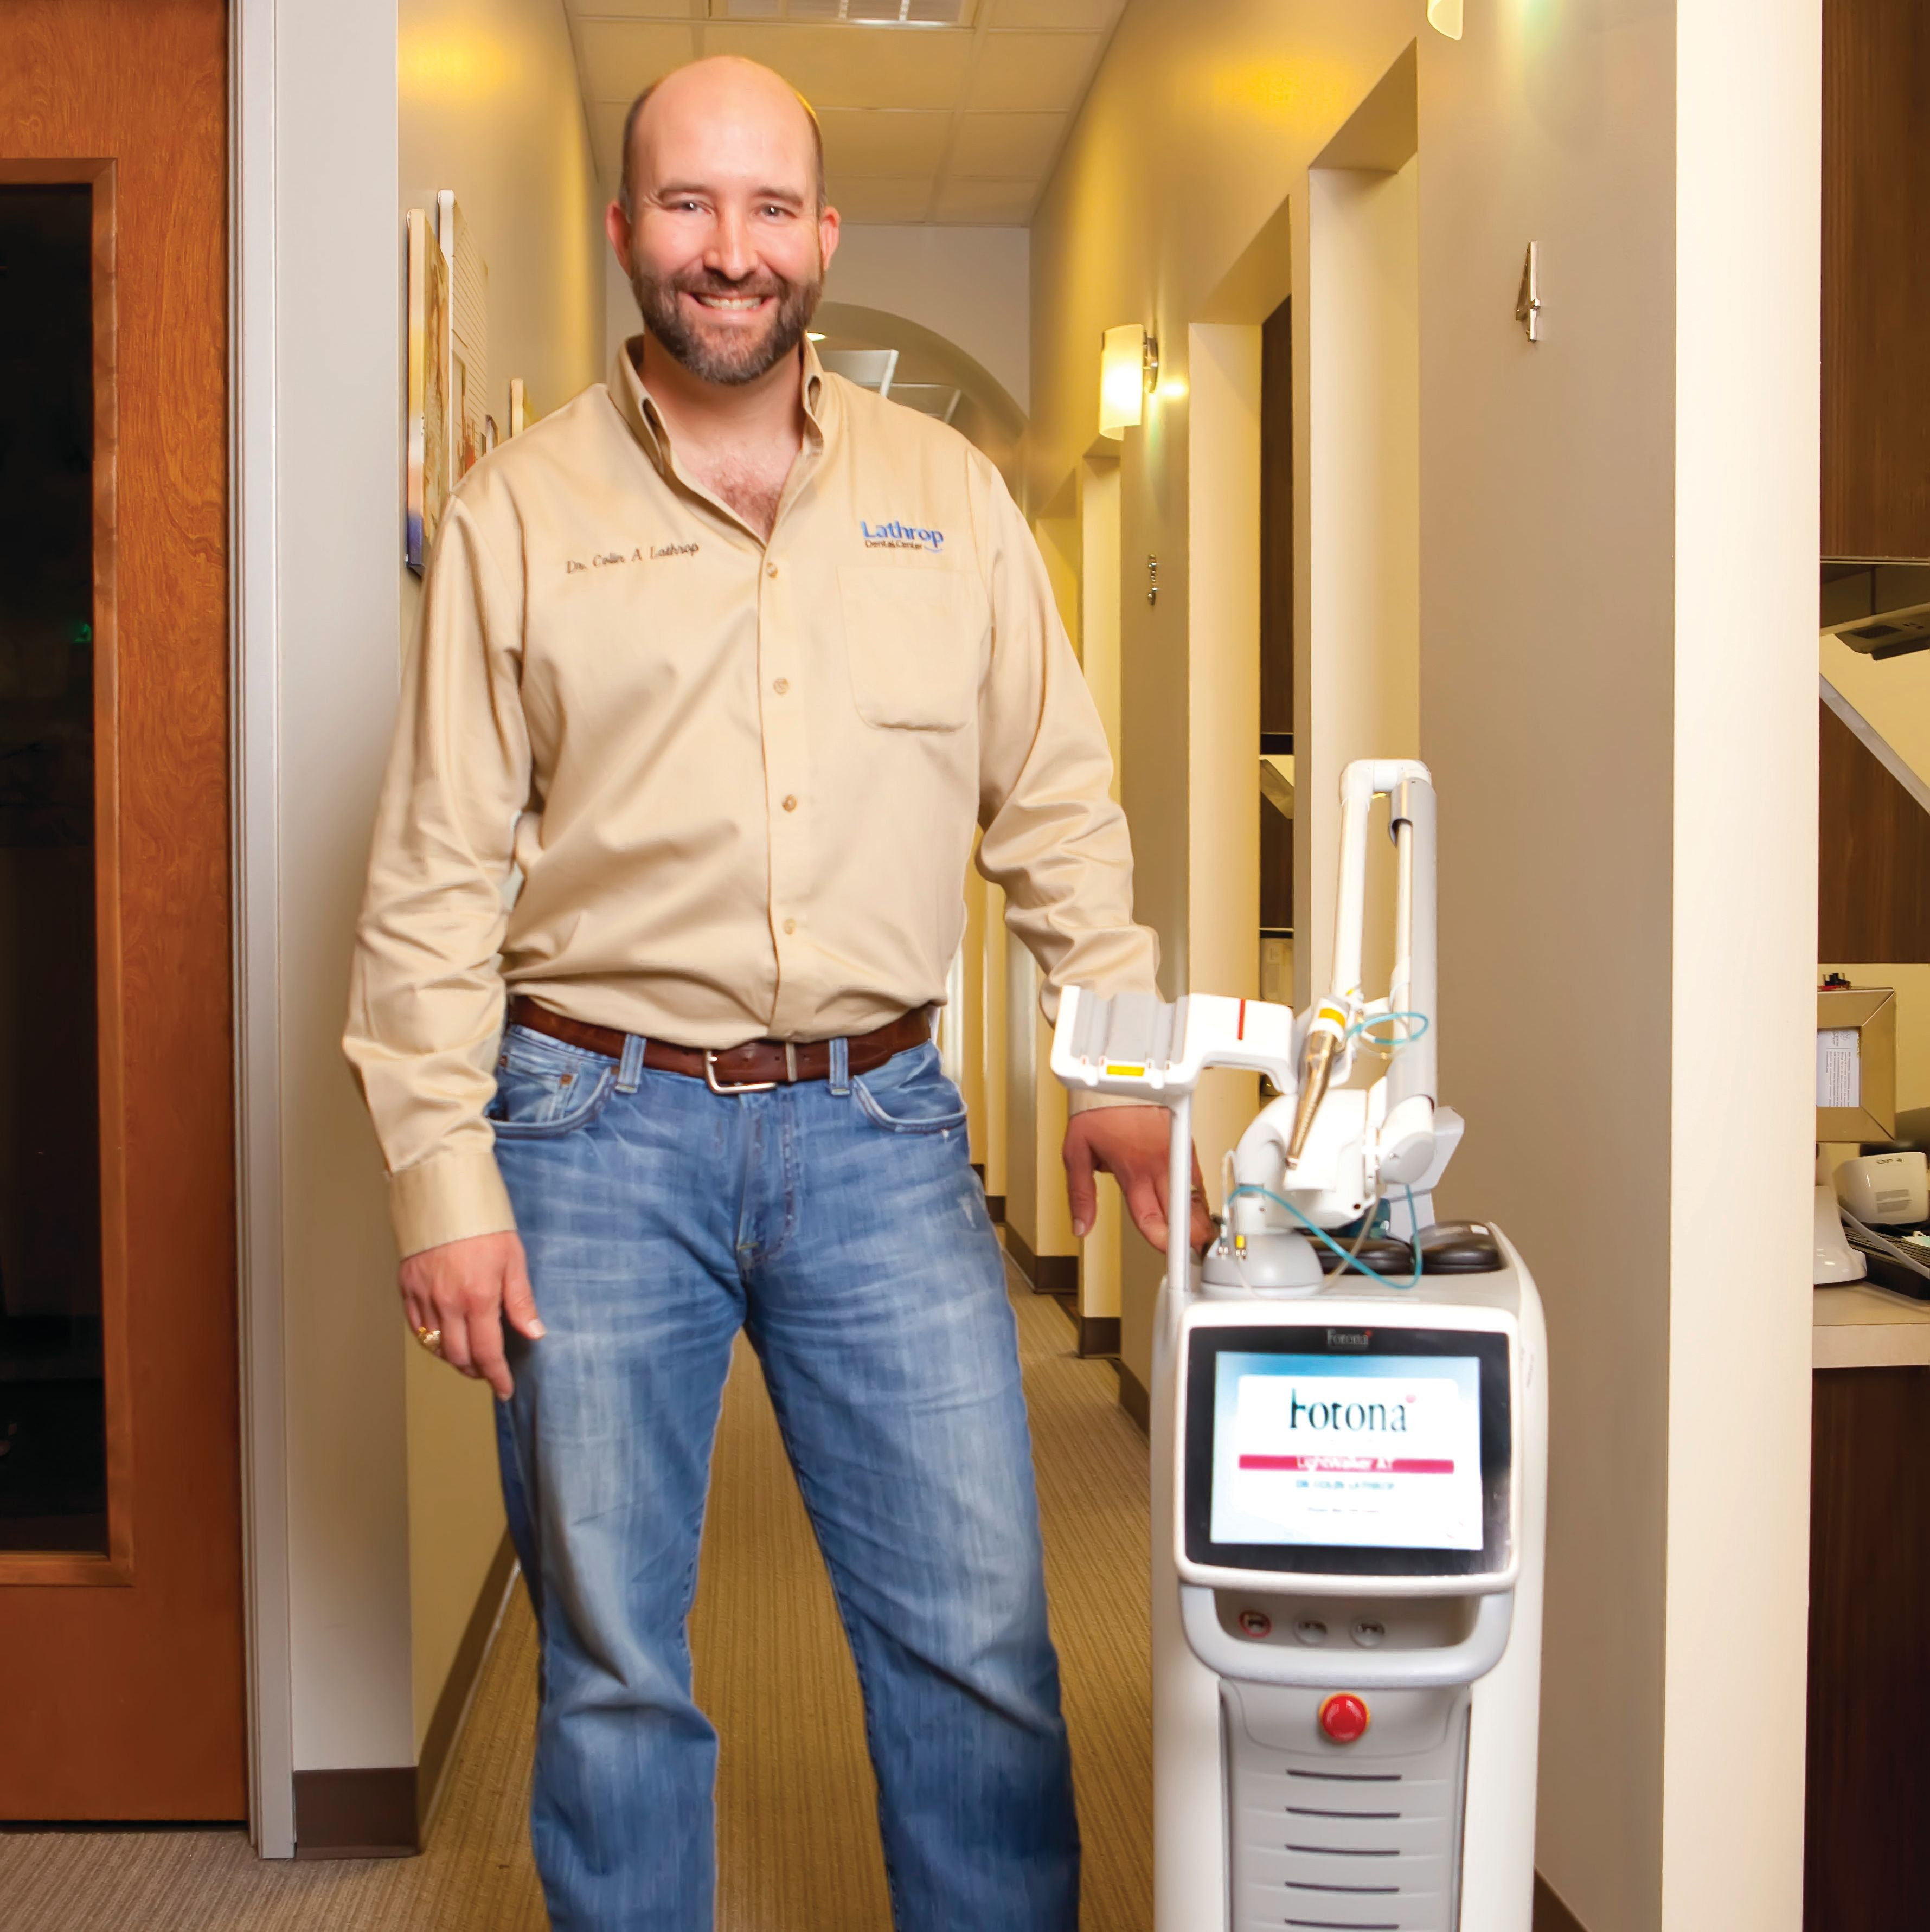 find a dentist houstonia colin lathrop lathrop dental center